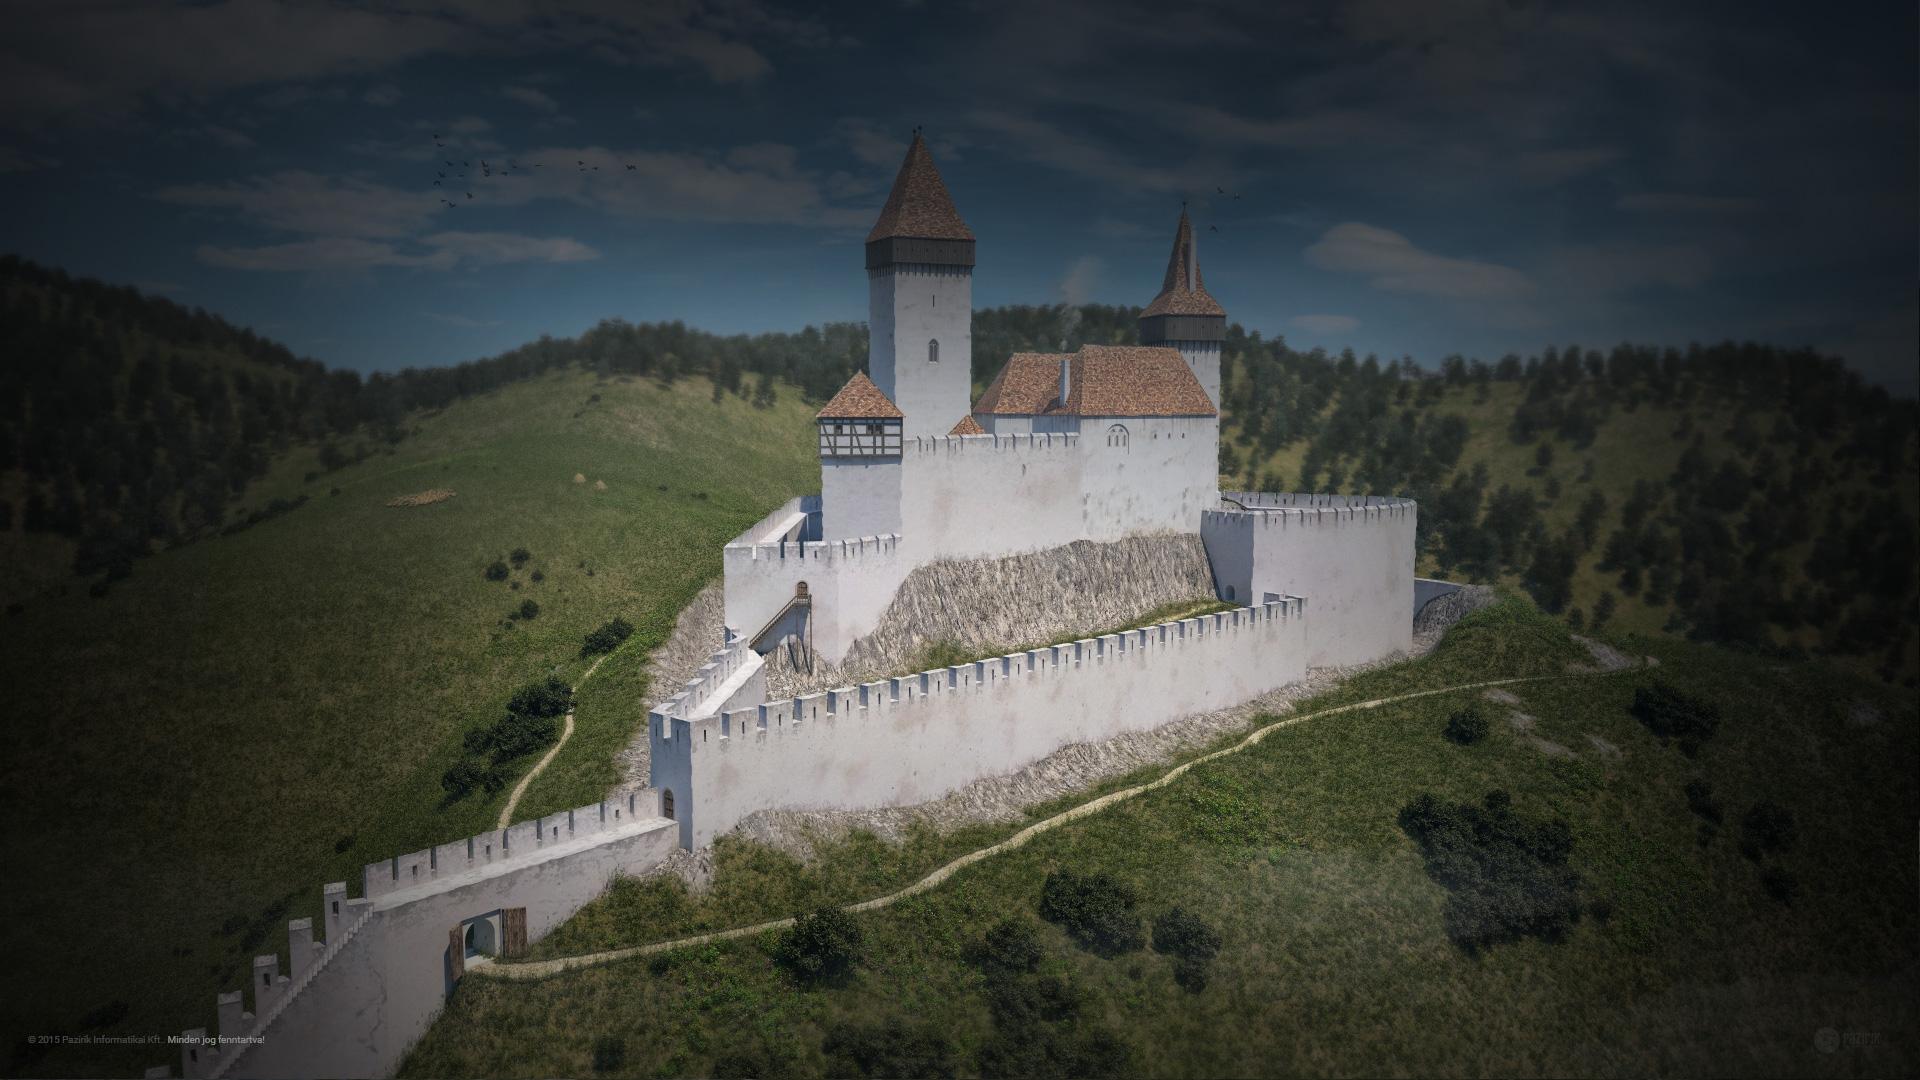 Visegrádi vár, mint királyi rezidencia